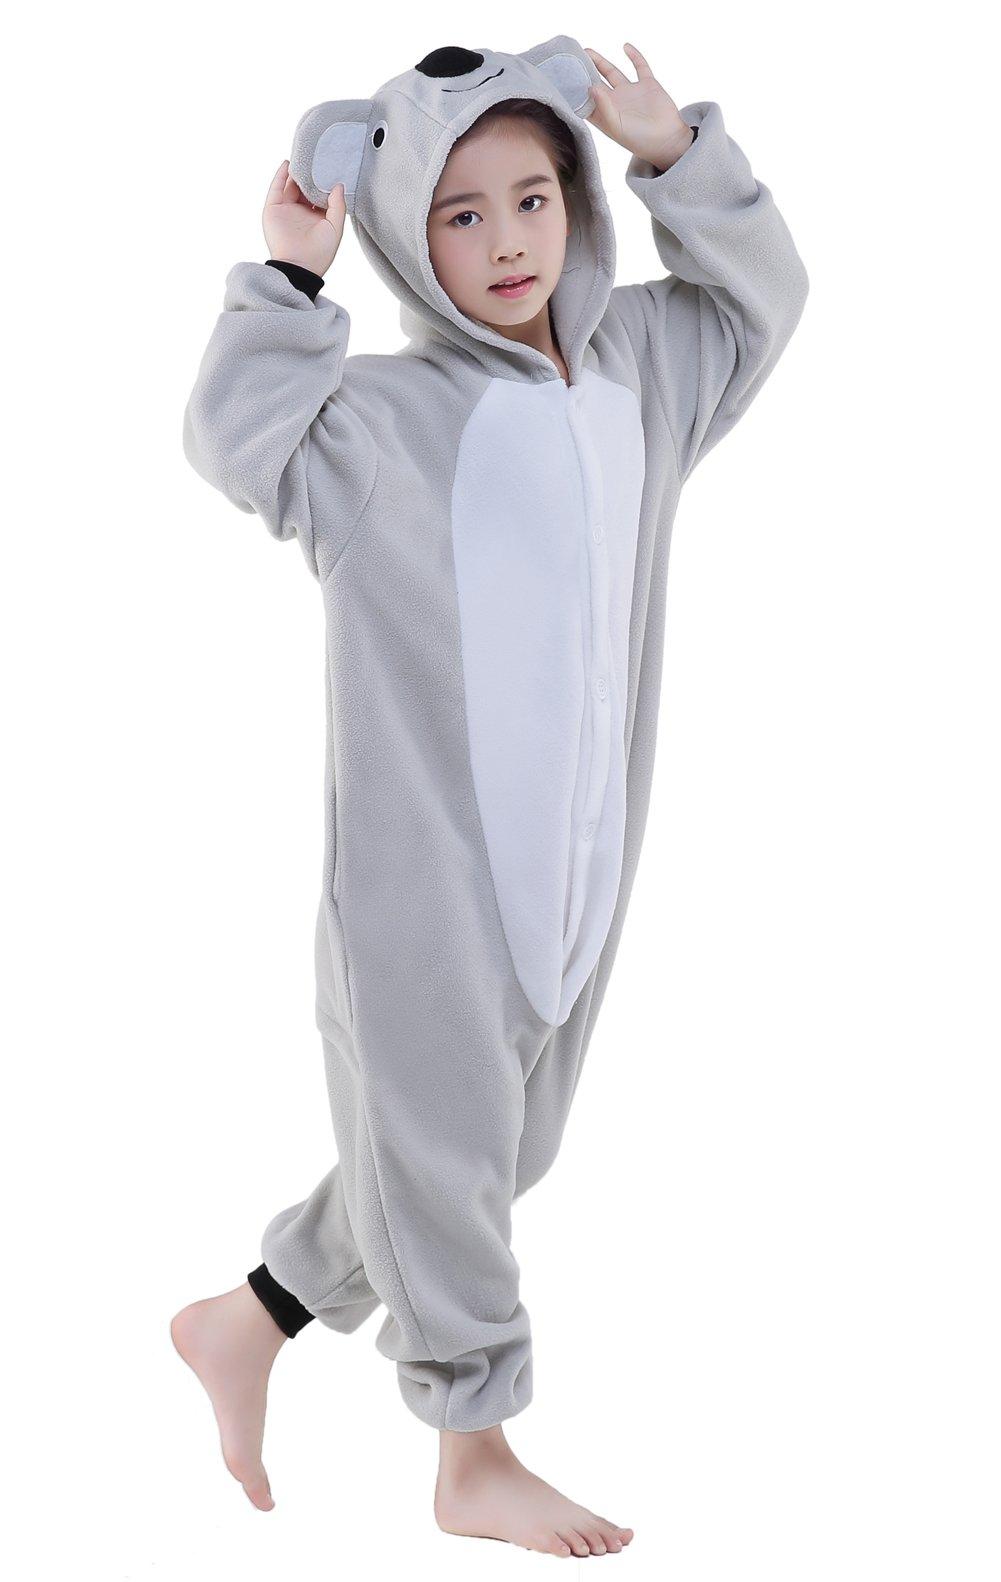 CANASOUR Polyster Halloween Kids Animal Costumes Cosplay Pajamas